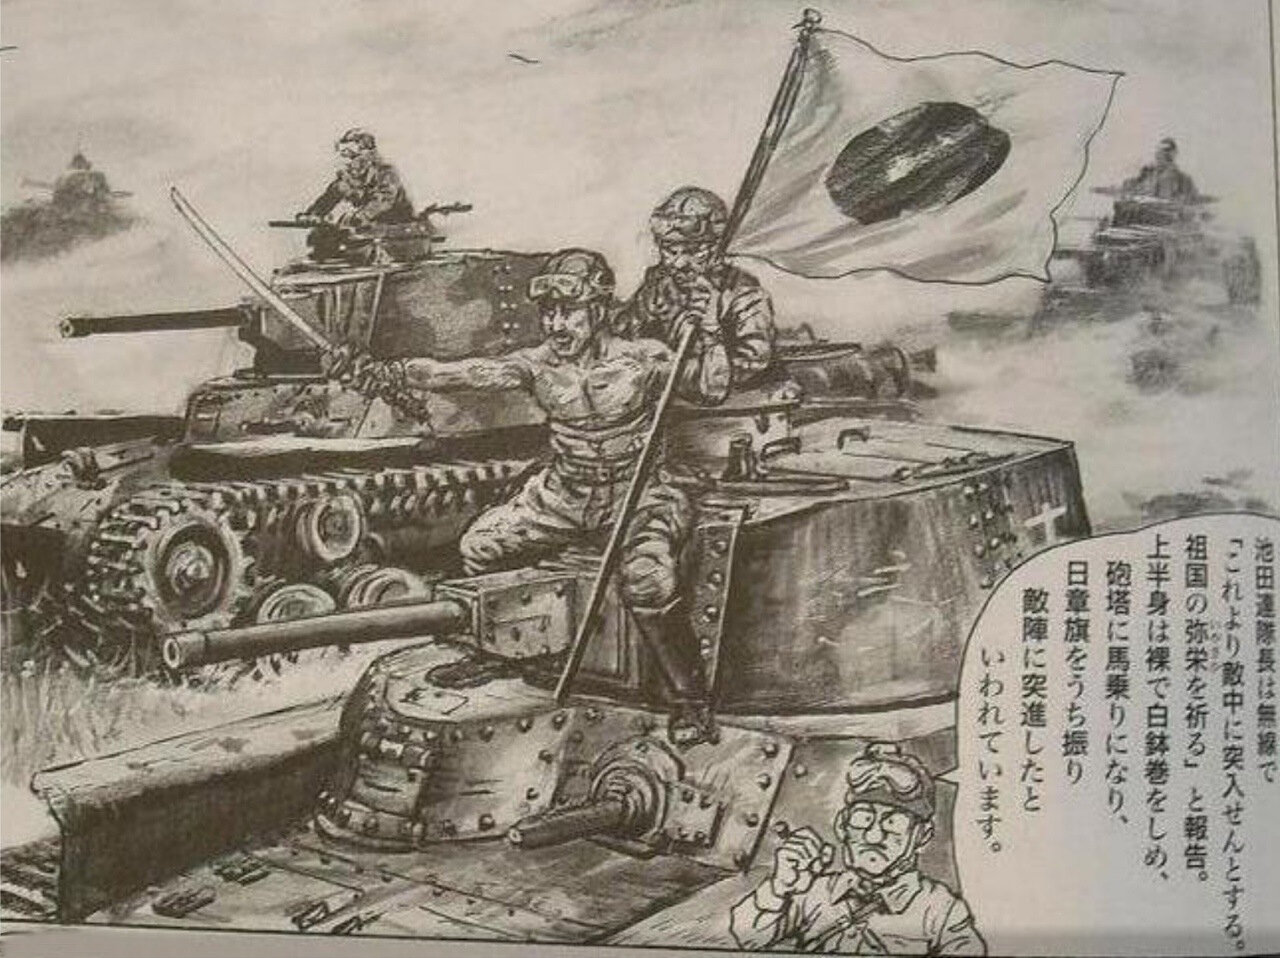 Японский самурай на танке против советского морпеха с автоматом